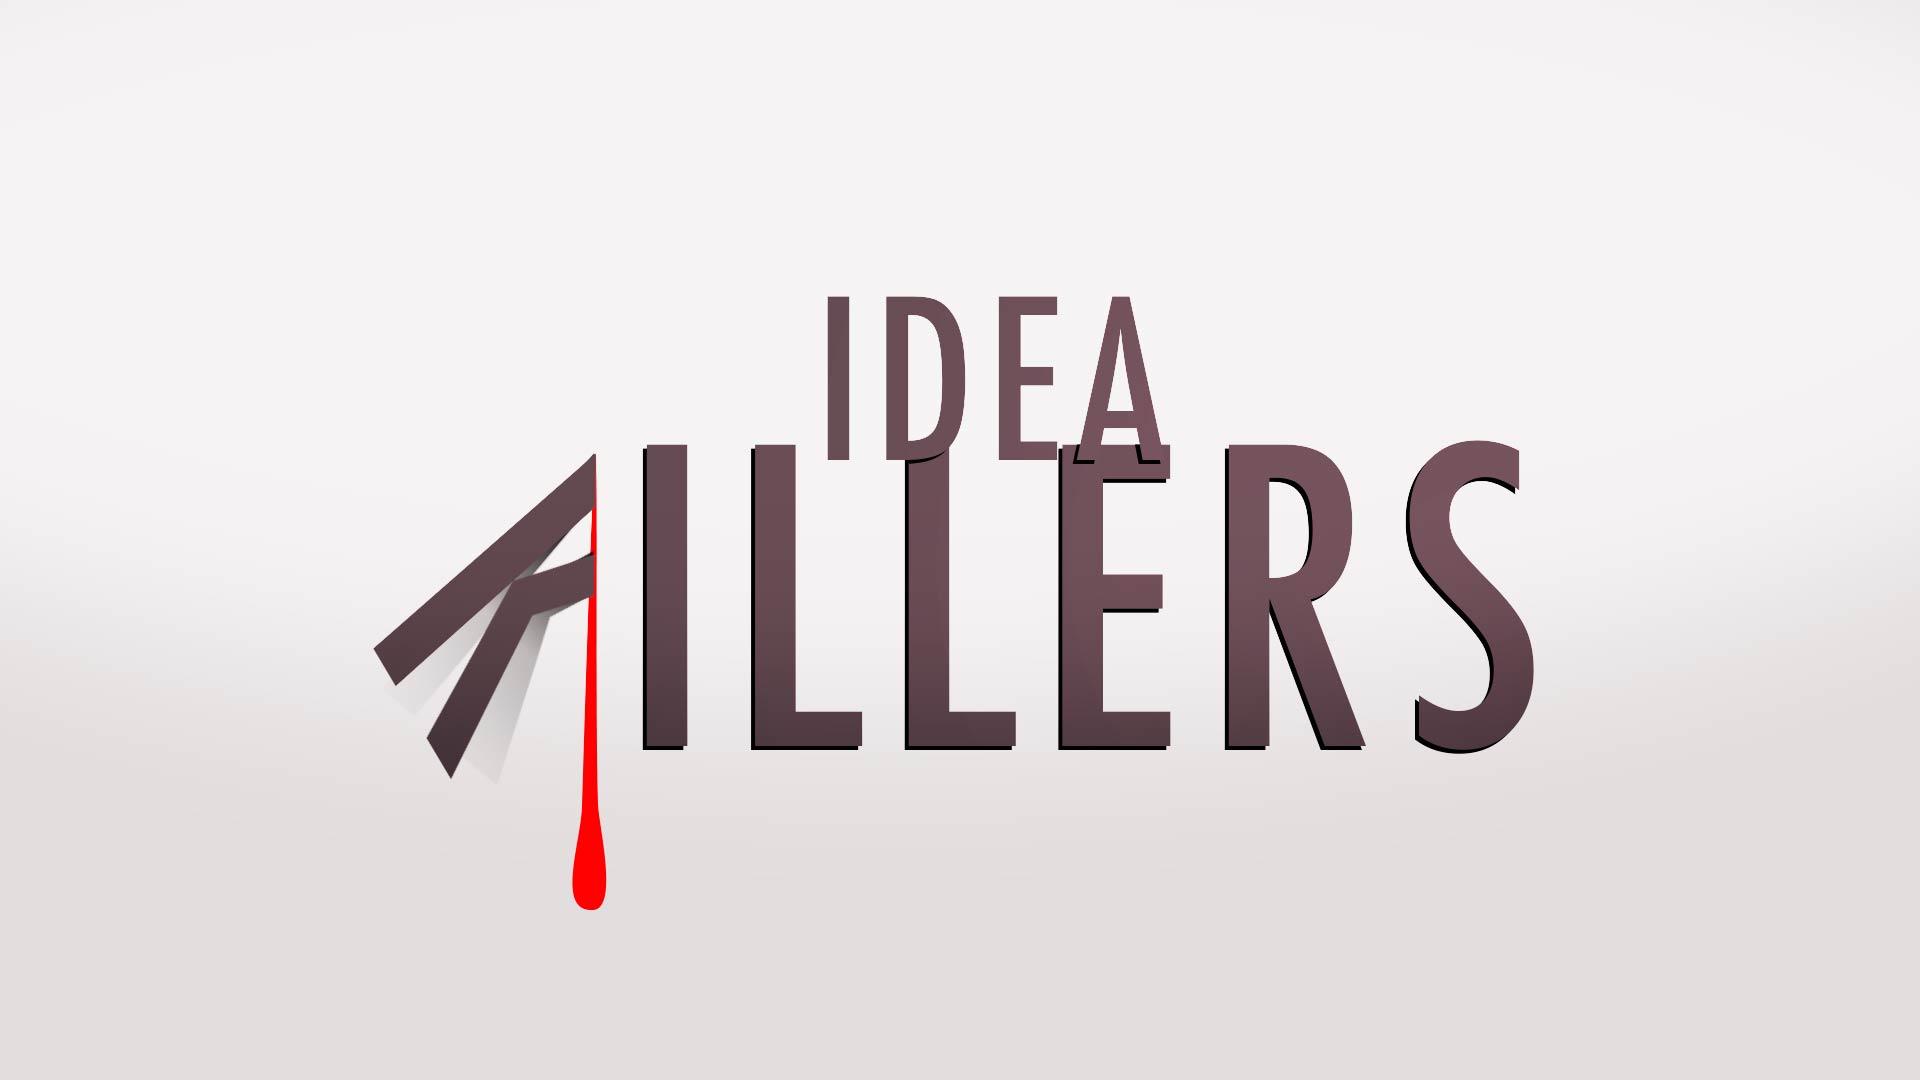 Idea Killers Style Frame